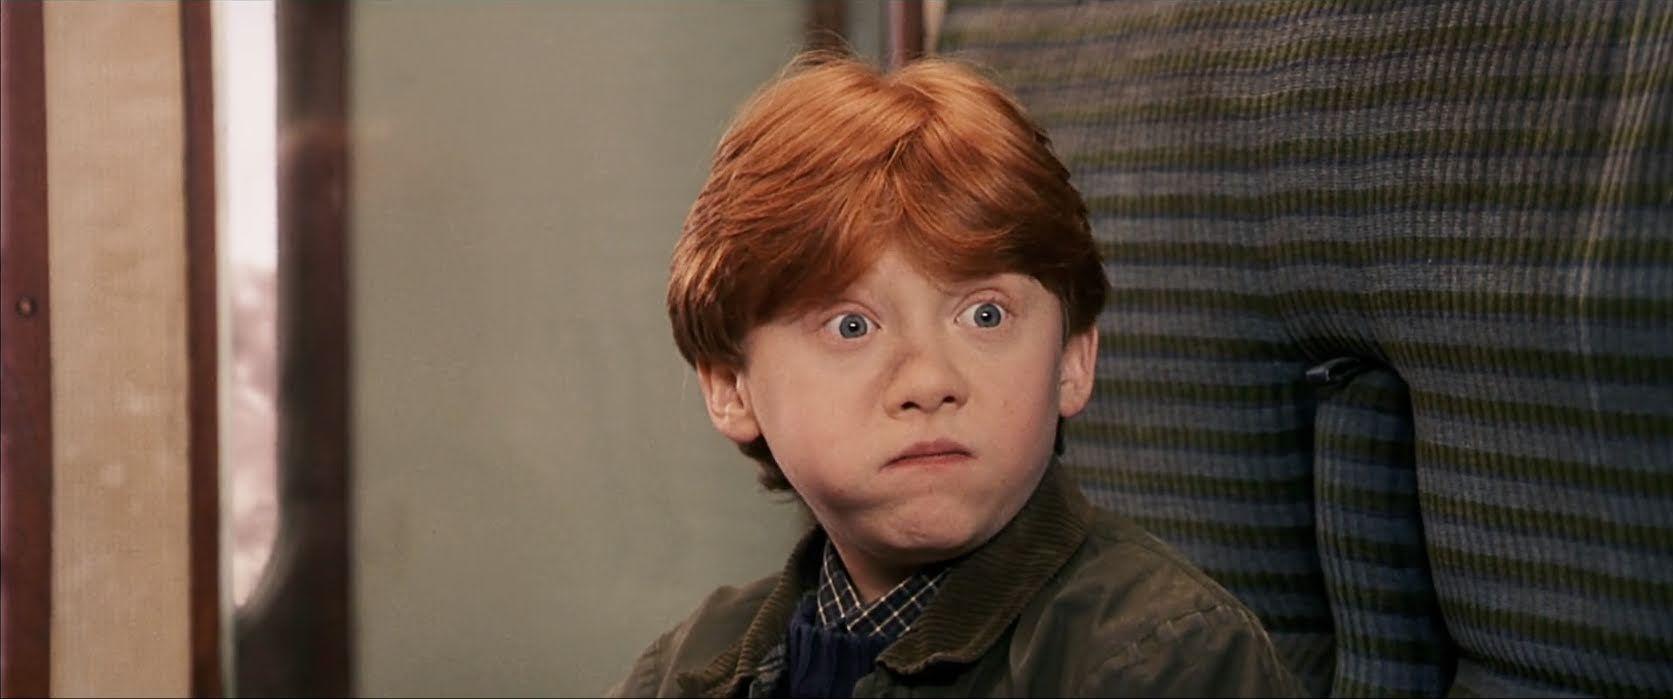 Harry Potter Abridged 1 7 Part I Harry Potter Ron Weasley Harry Potter Gif Harry Potter Obsession